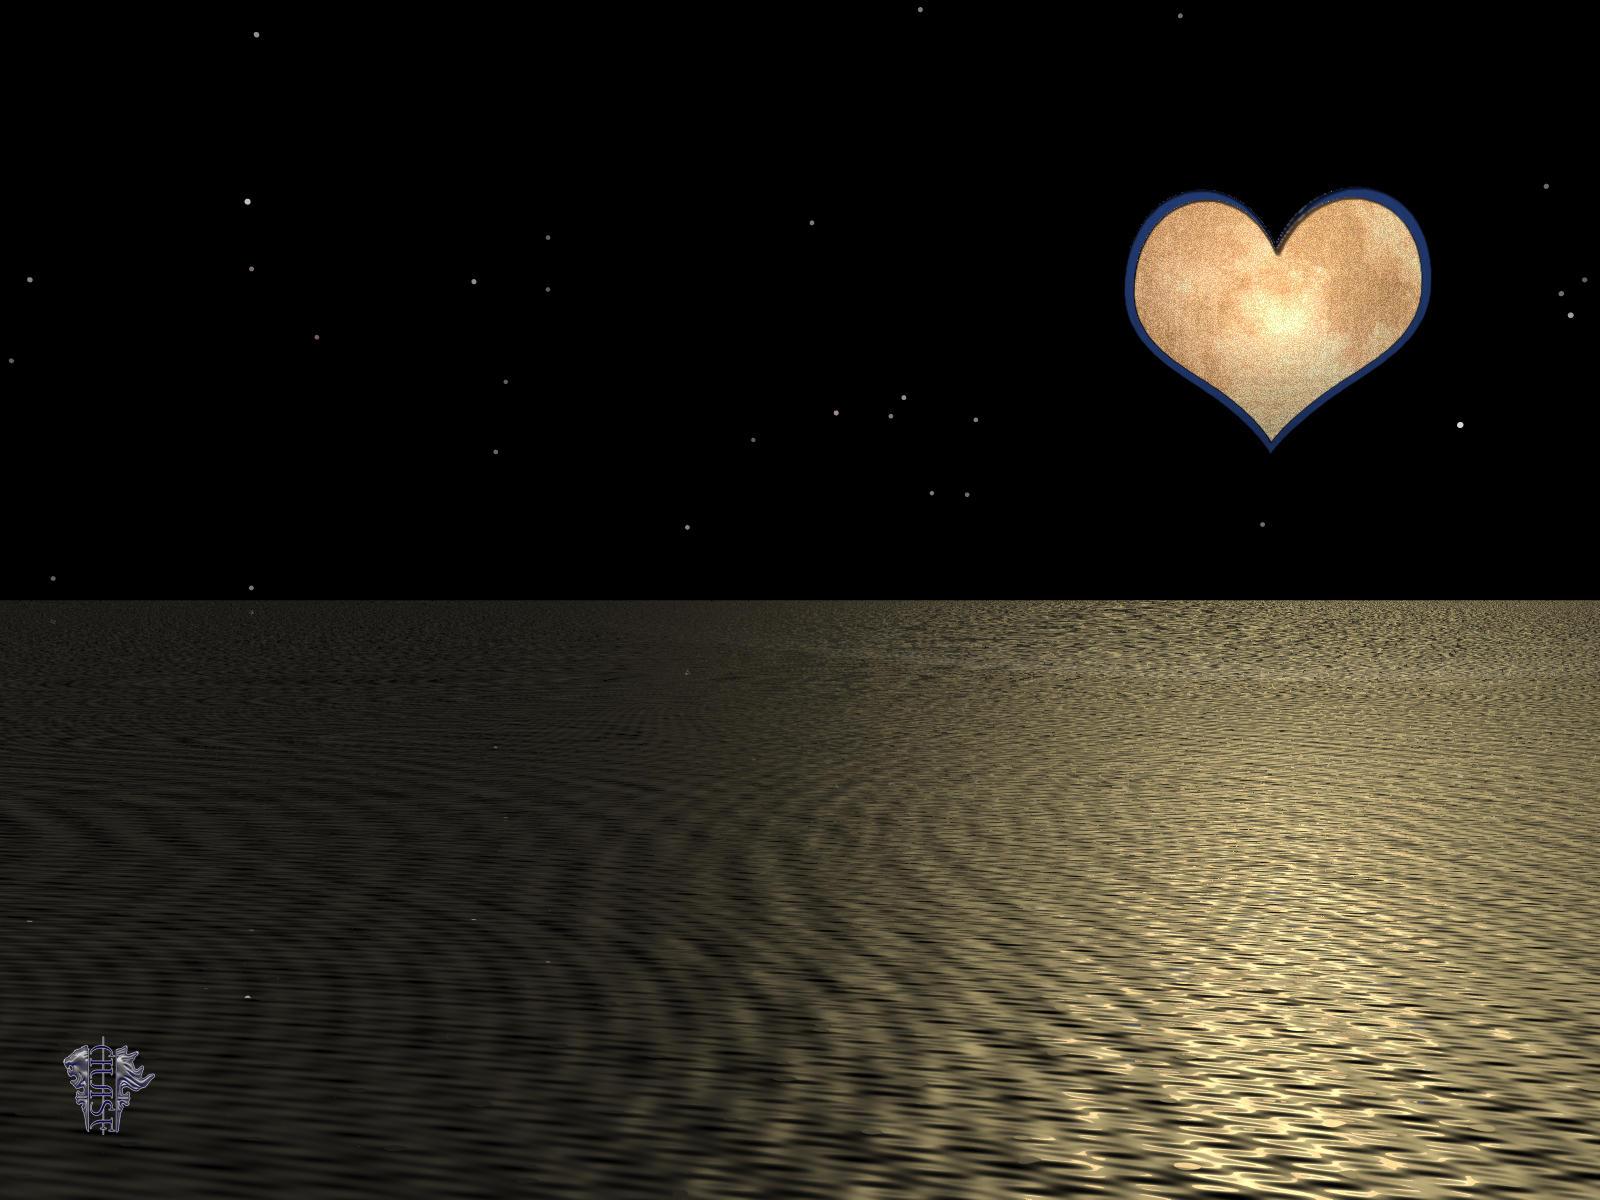 Kingdom Hearts Moon By Chasef On Deviantart